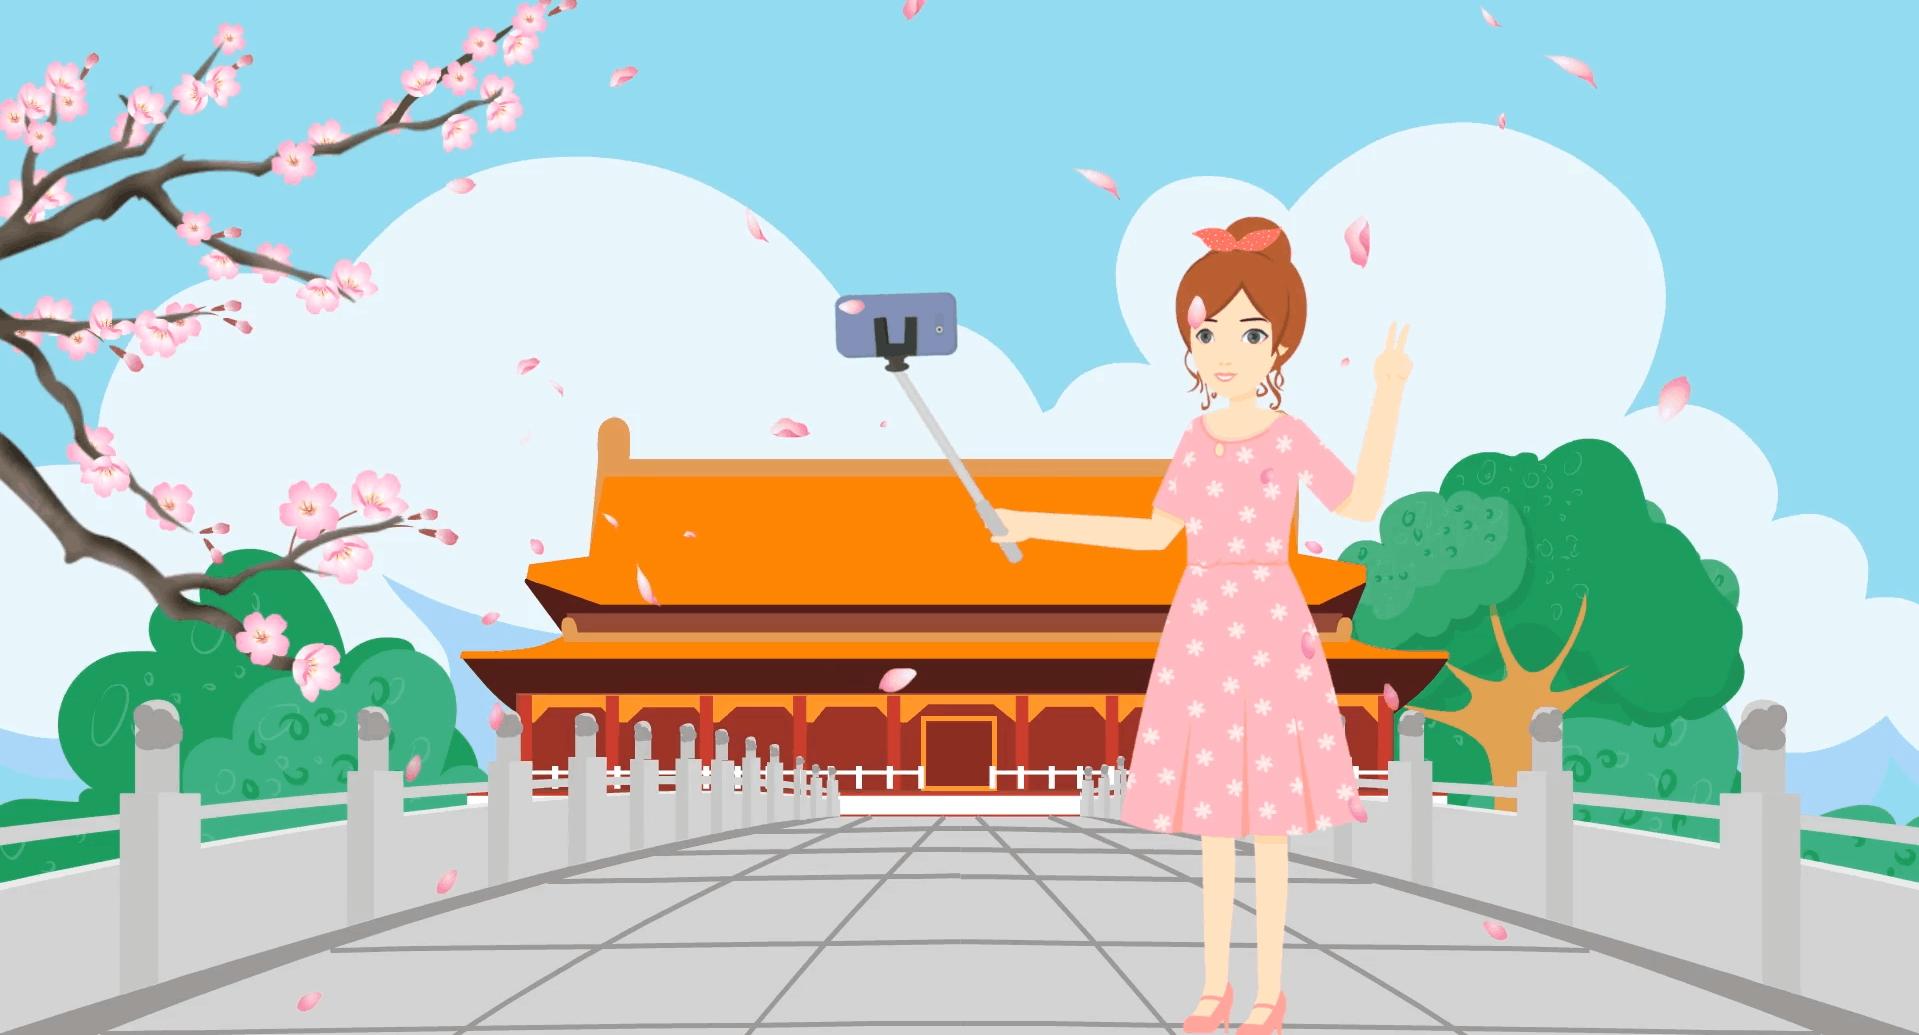 Mango Animate Provides a Free Character Design Software Program